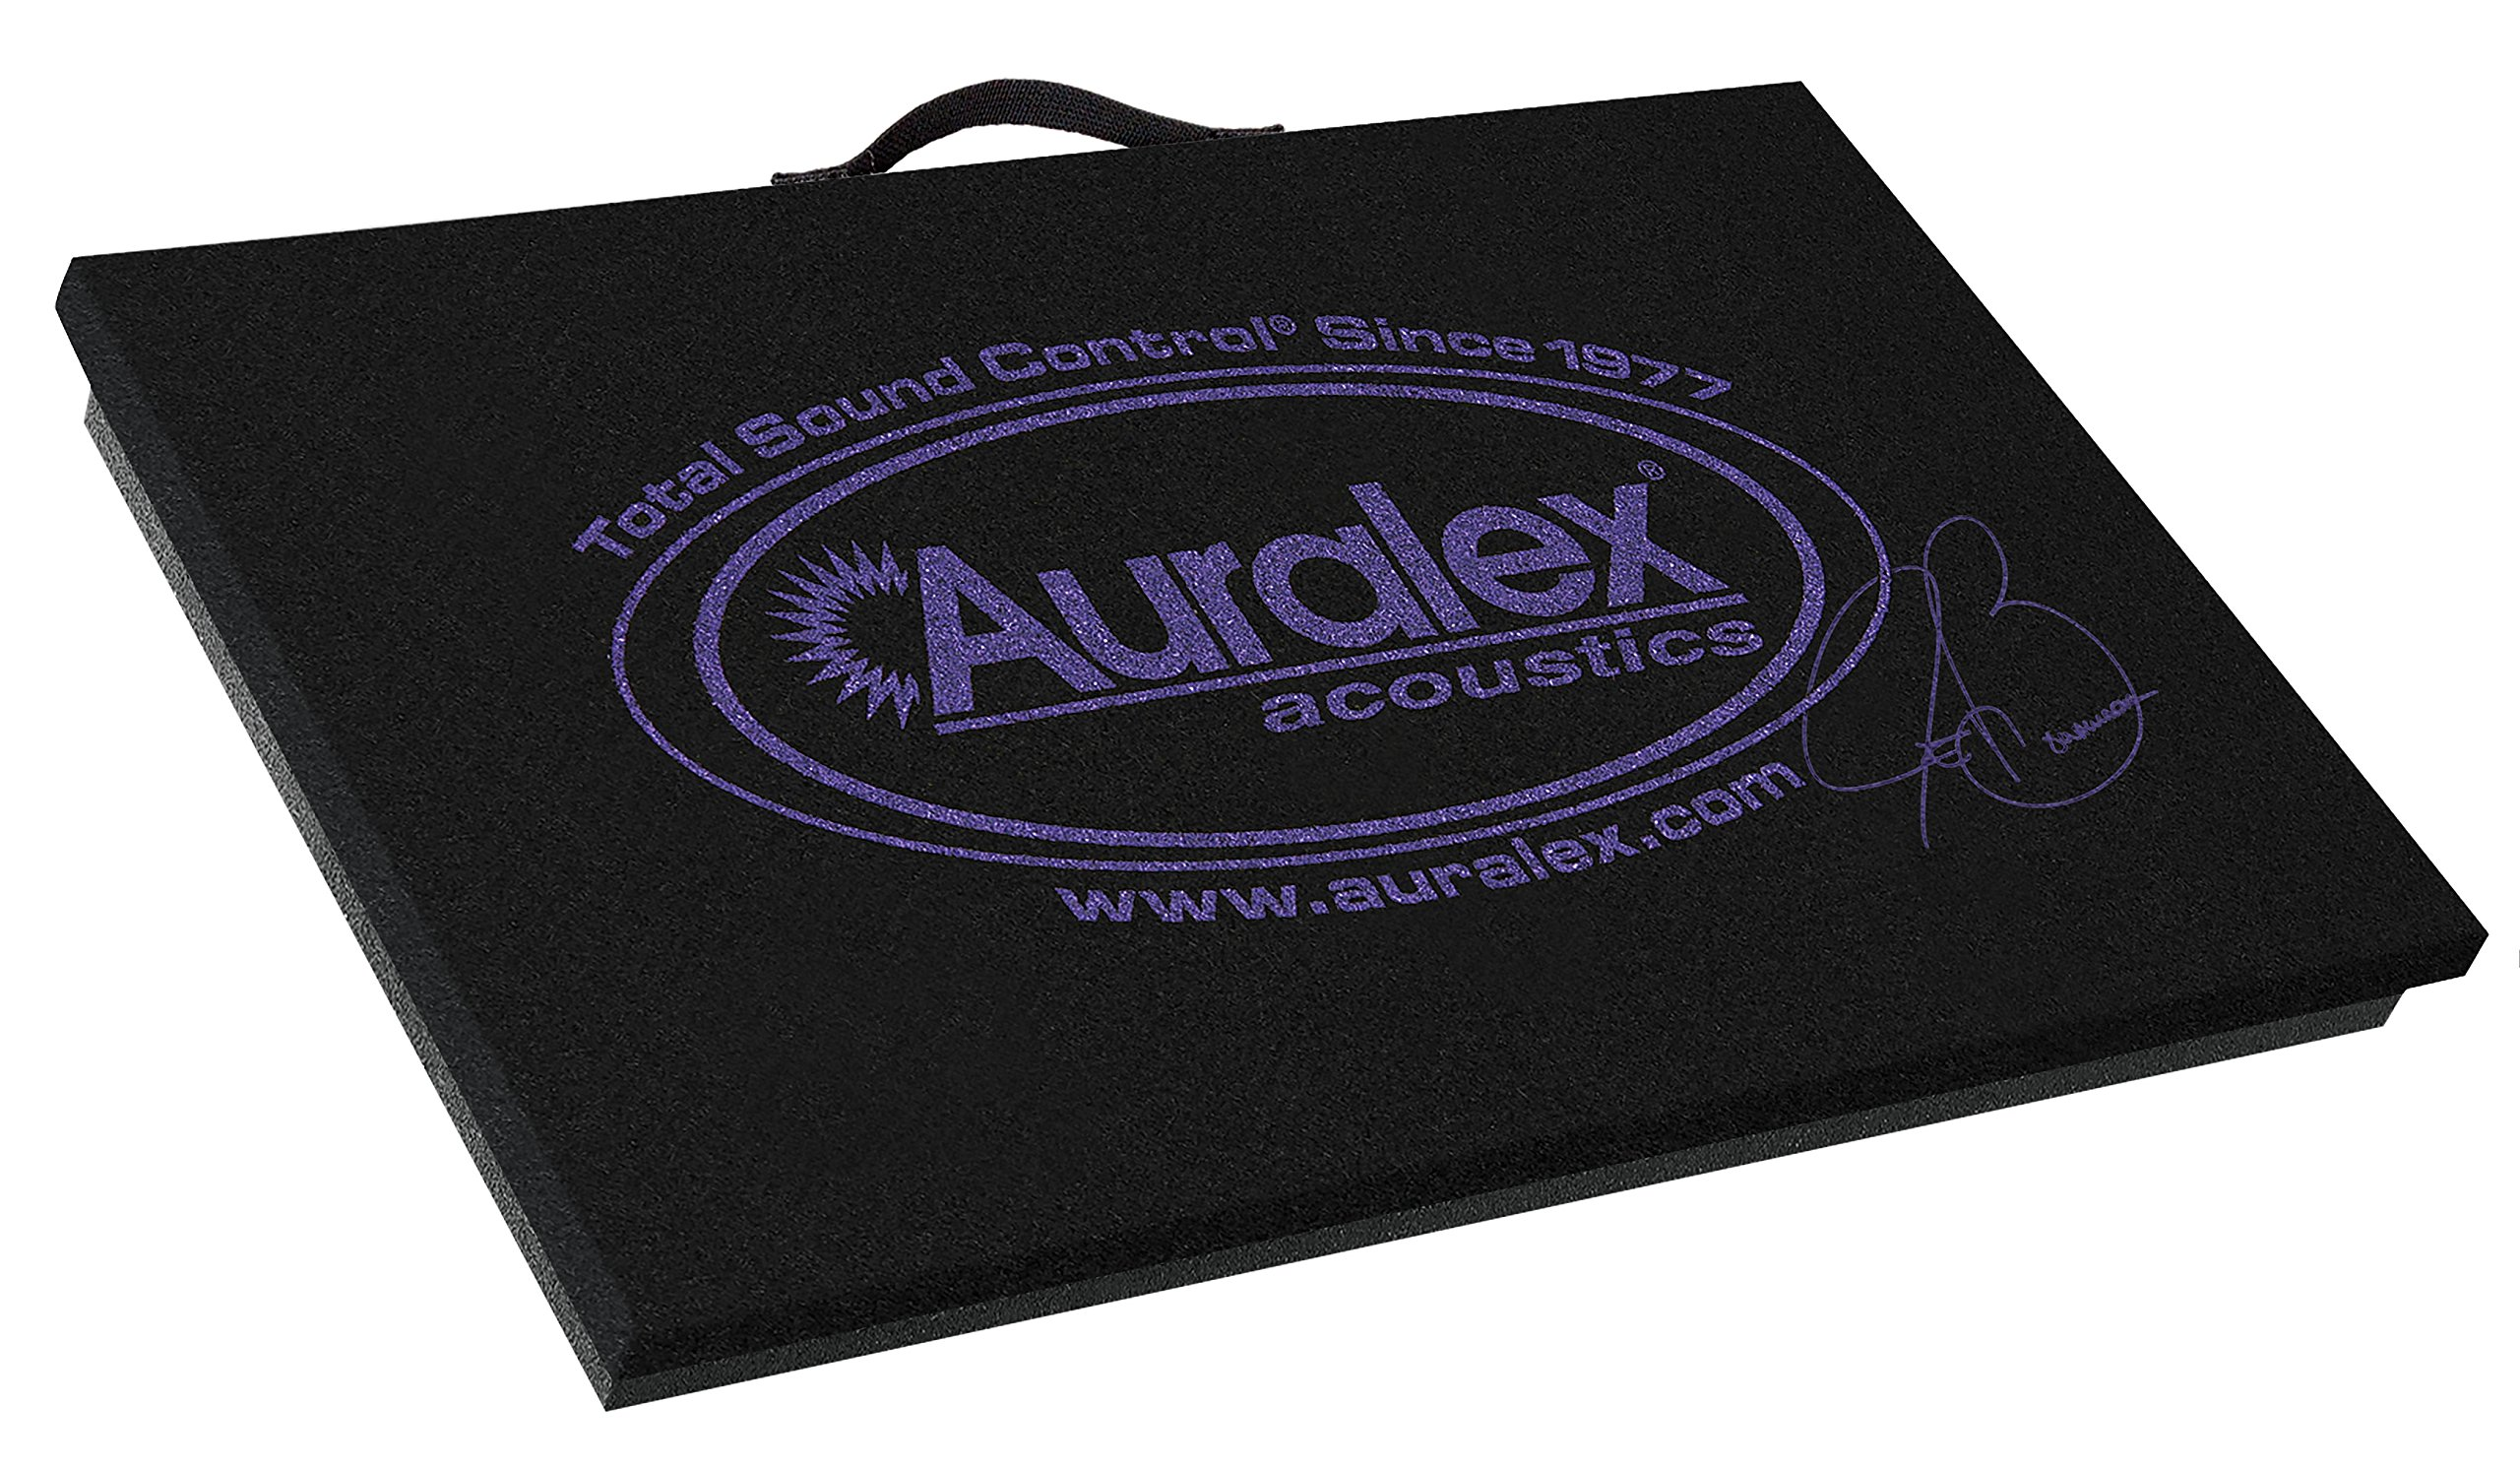 Auralex Acoustics GreatGRAMMA v2 Isolation Platform for Amplifiers, 1.75'' x 19'' x 30'' by Auralex Acoustics